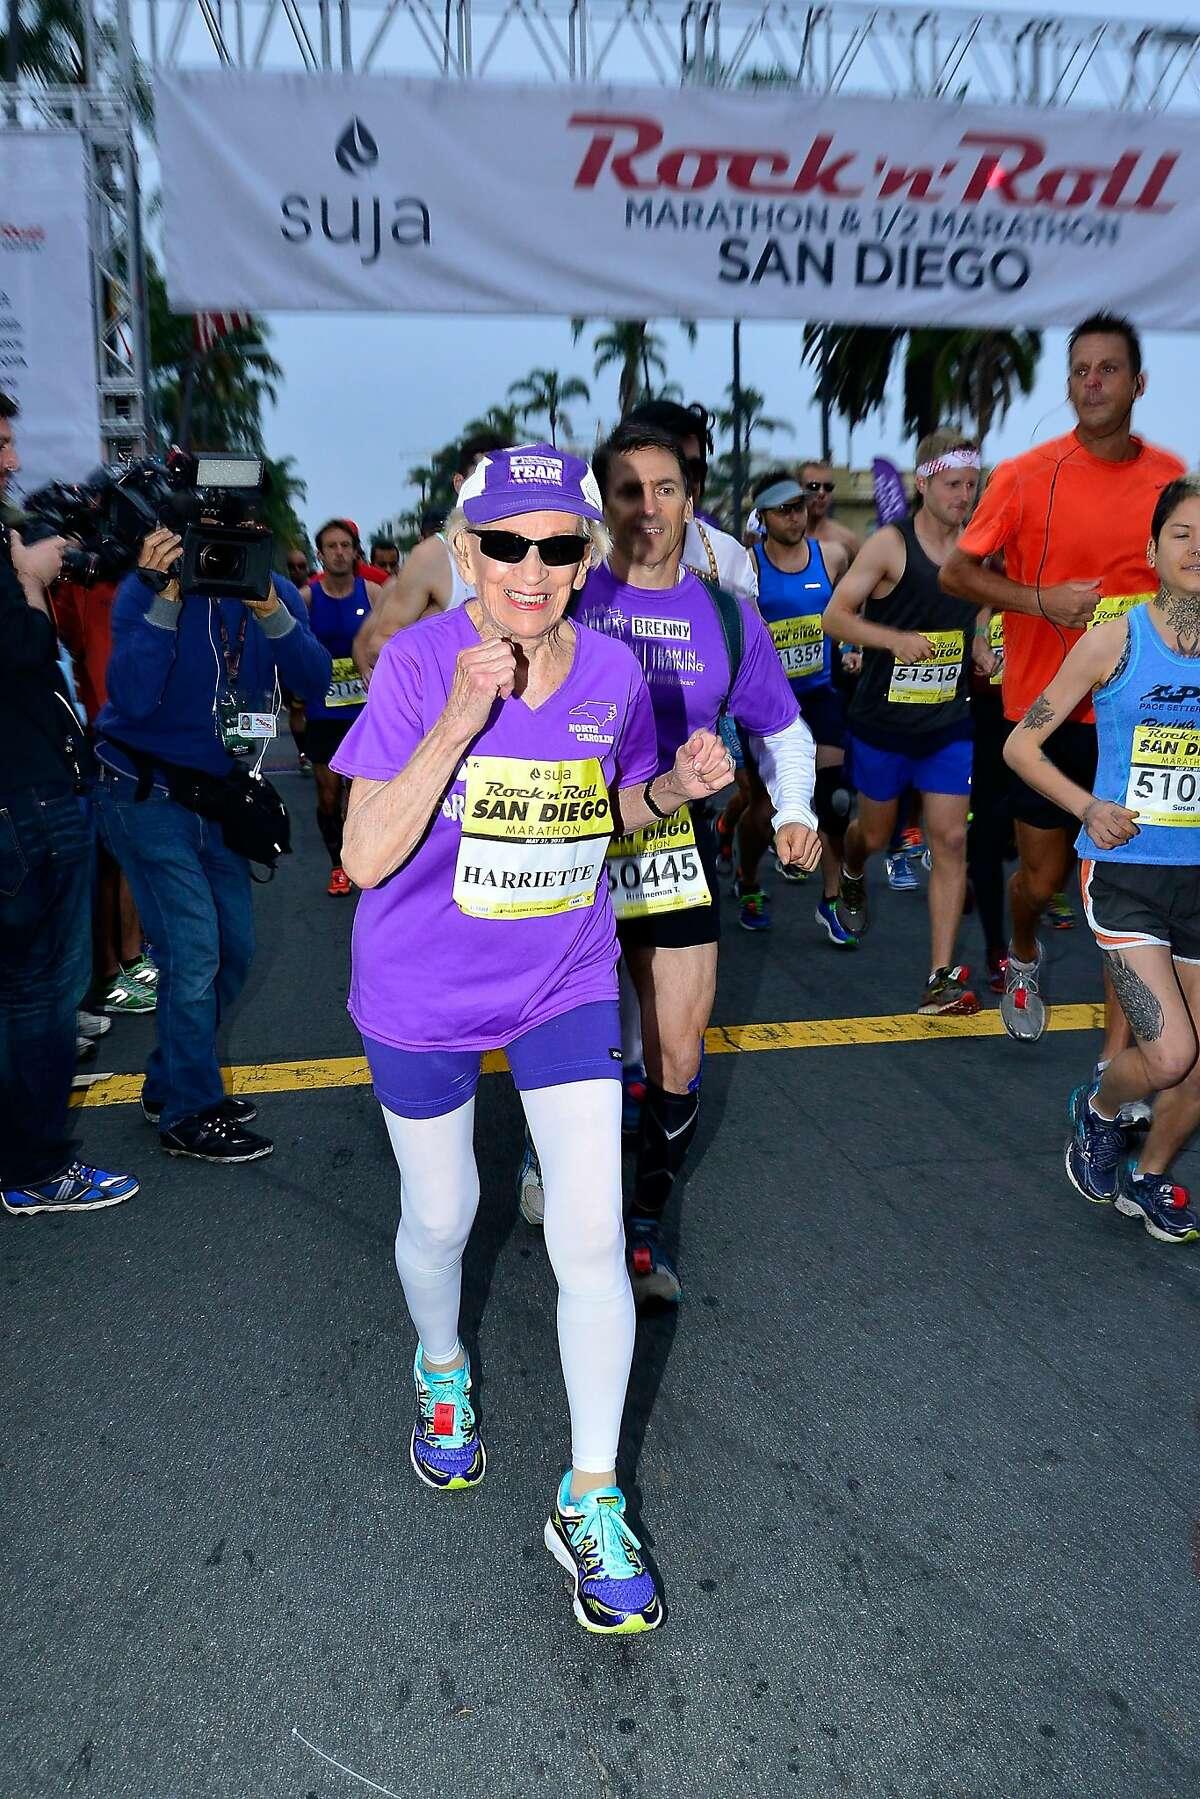 29. San Diego, California Total score: 54.61 Food rank: 23 Fitness rank: 41